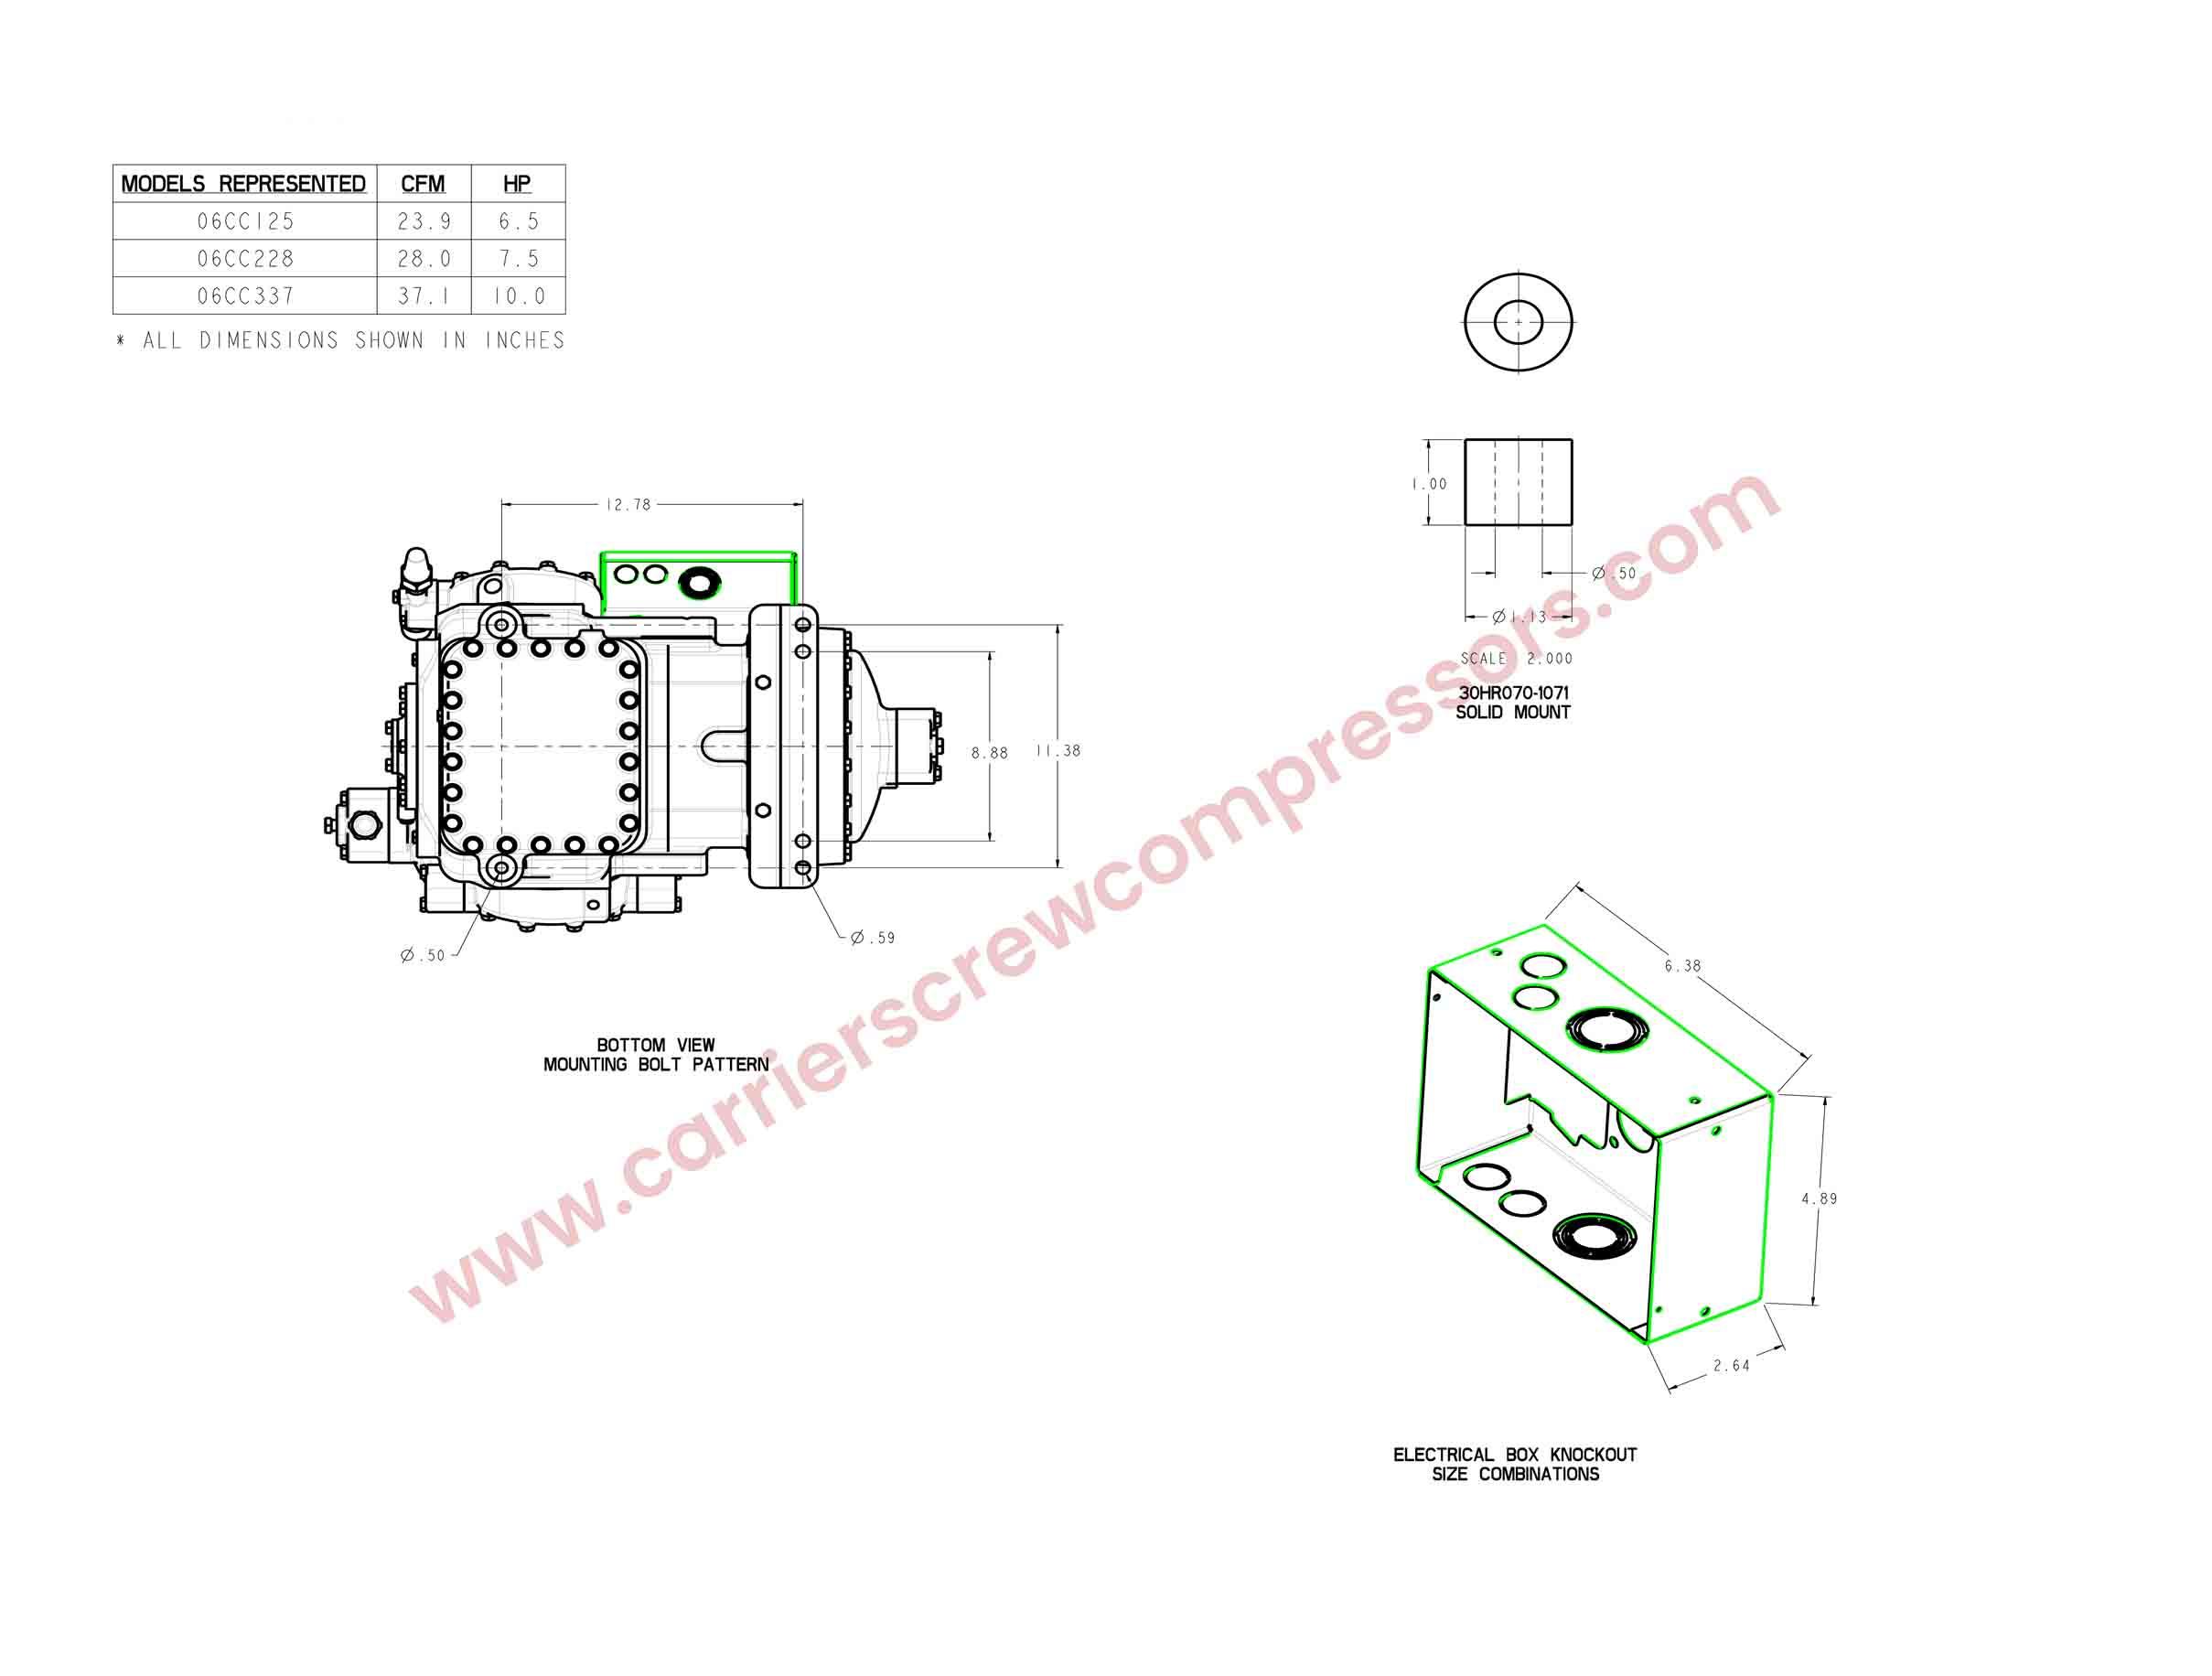 06CC125, 06CC228, 06CC337 Electronic Drawings